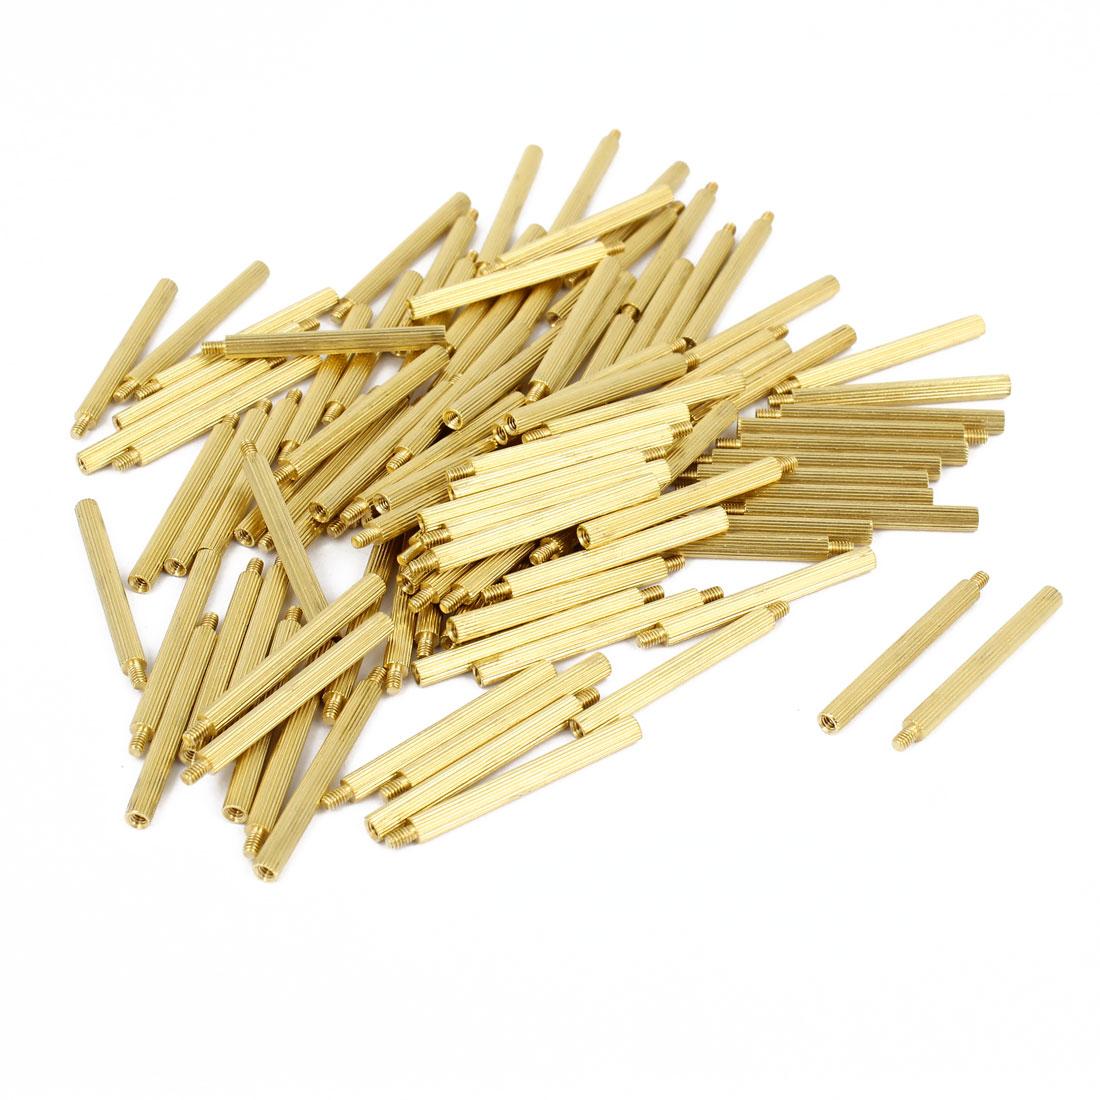 100 Pcs Male to Female Screw Brass Pillars Standoff Spacer M2x29mmx32mm